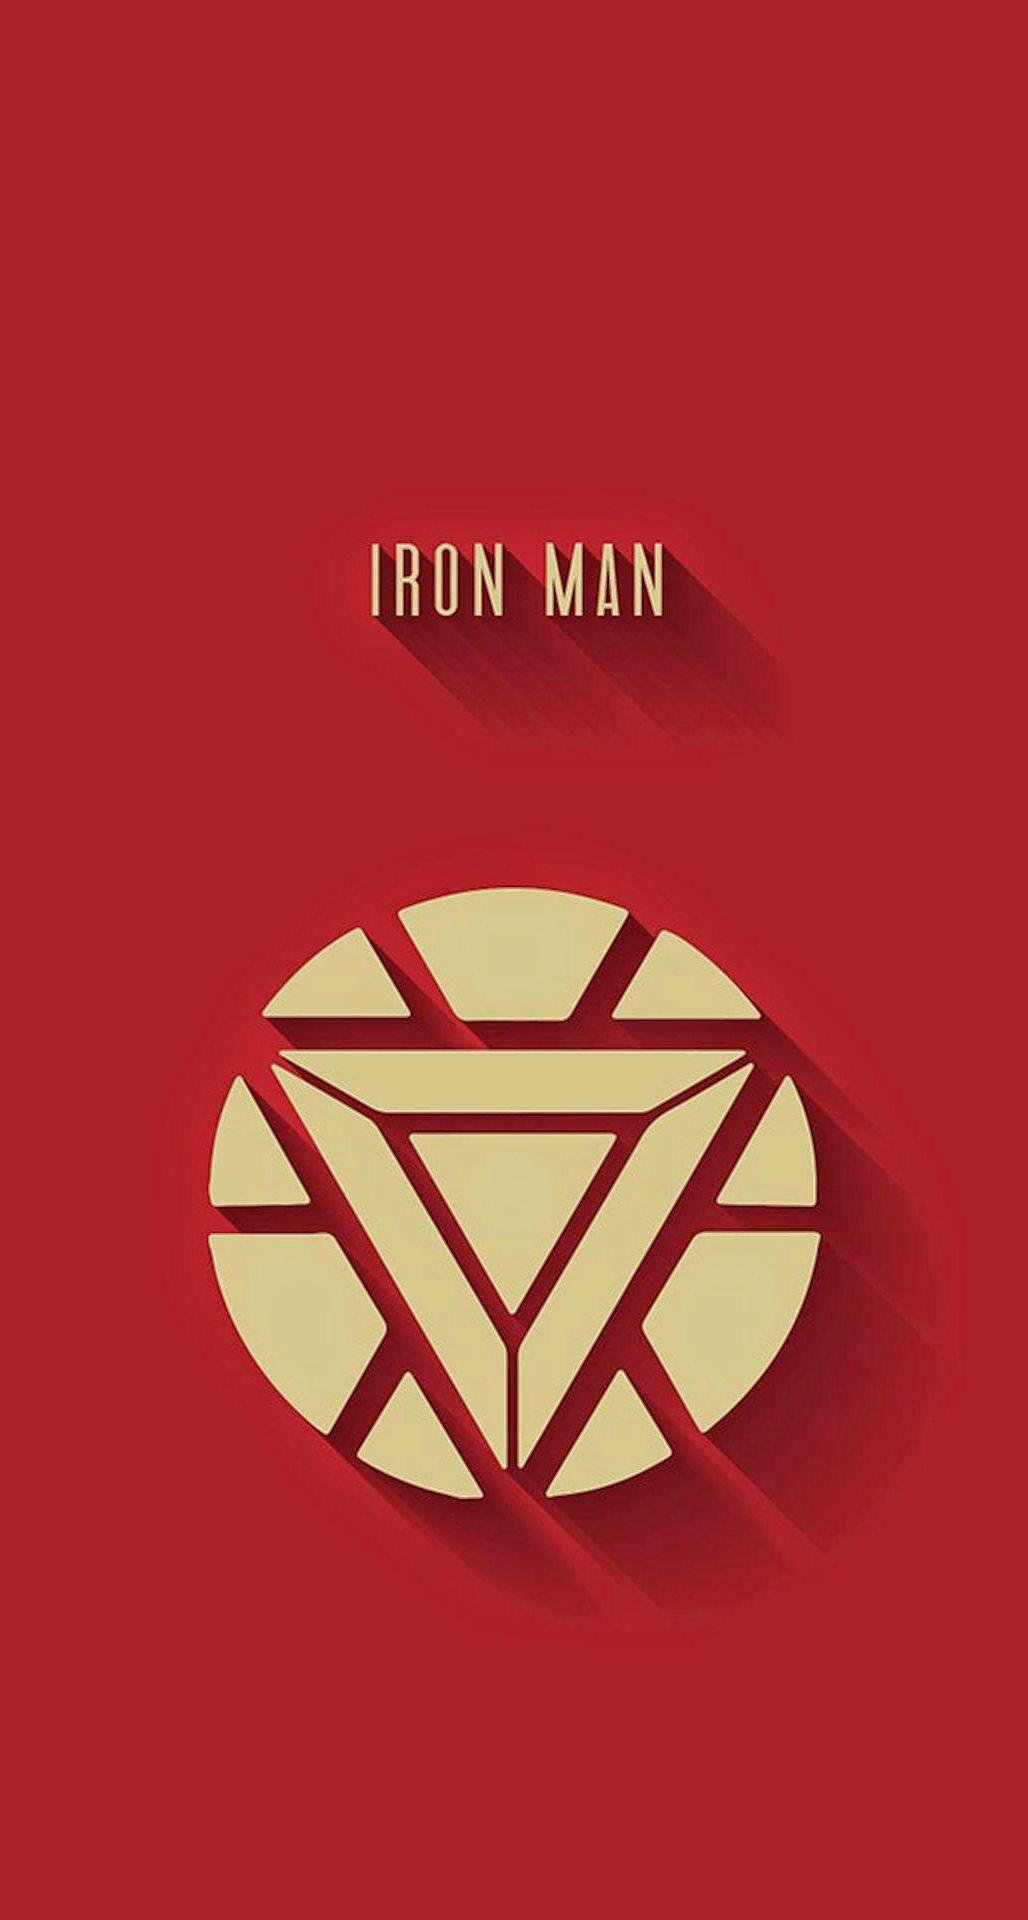 Ironman logo | Illustrations | Pinterest | Logos, Marvel ...